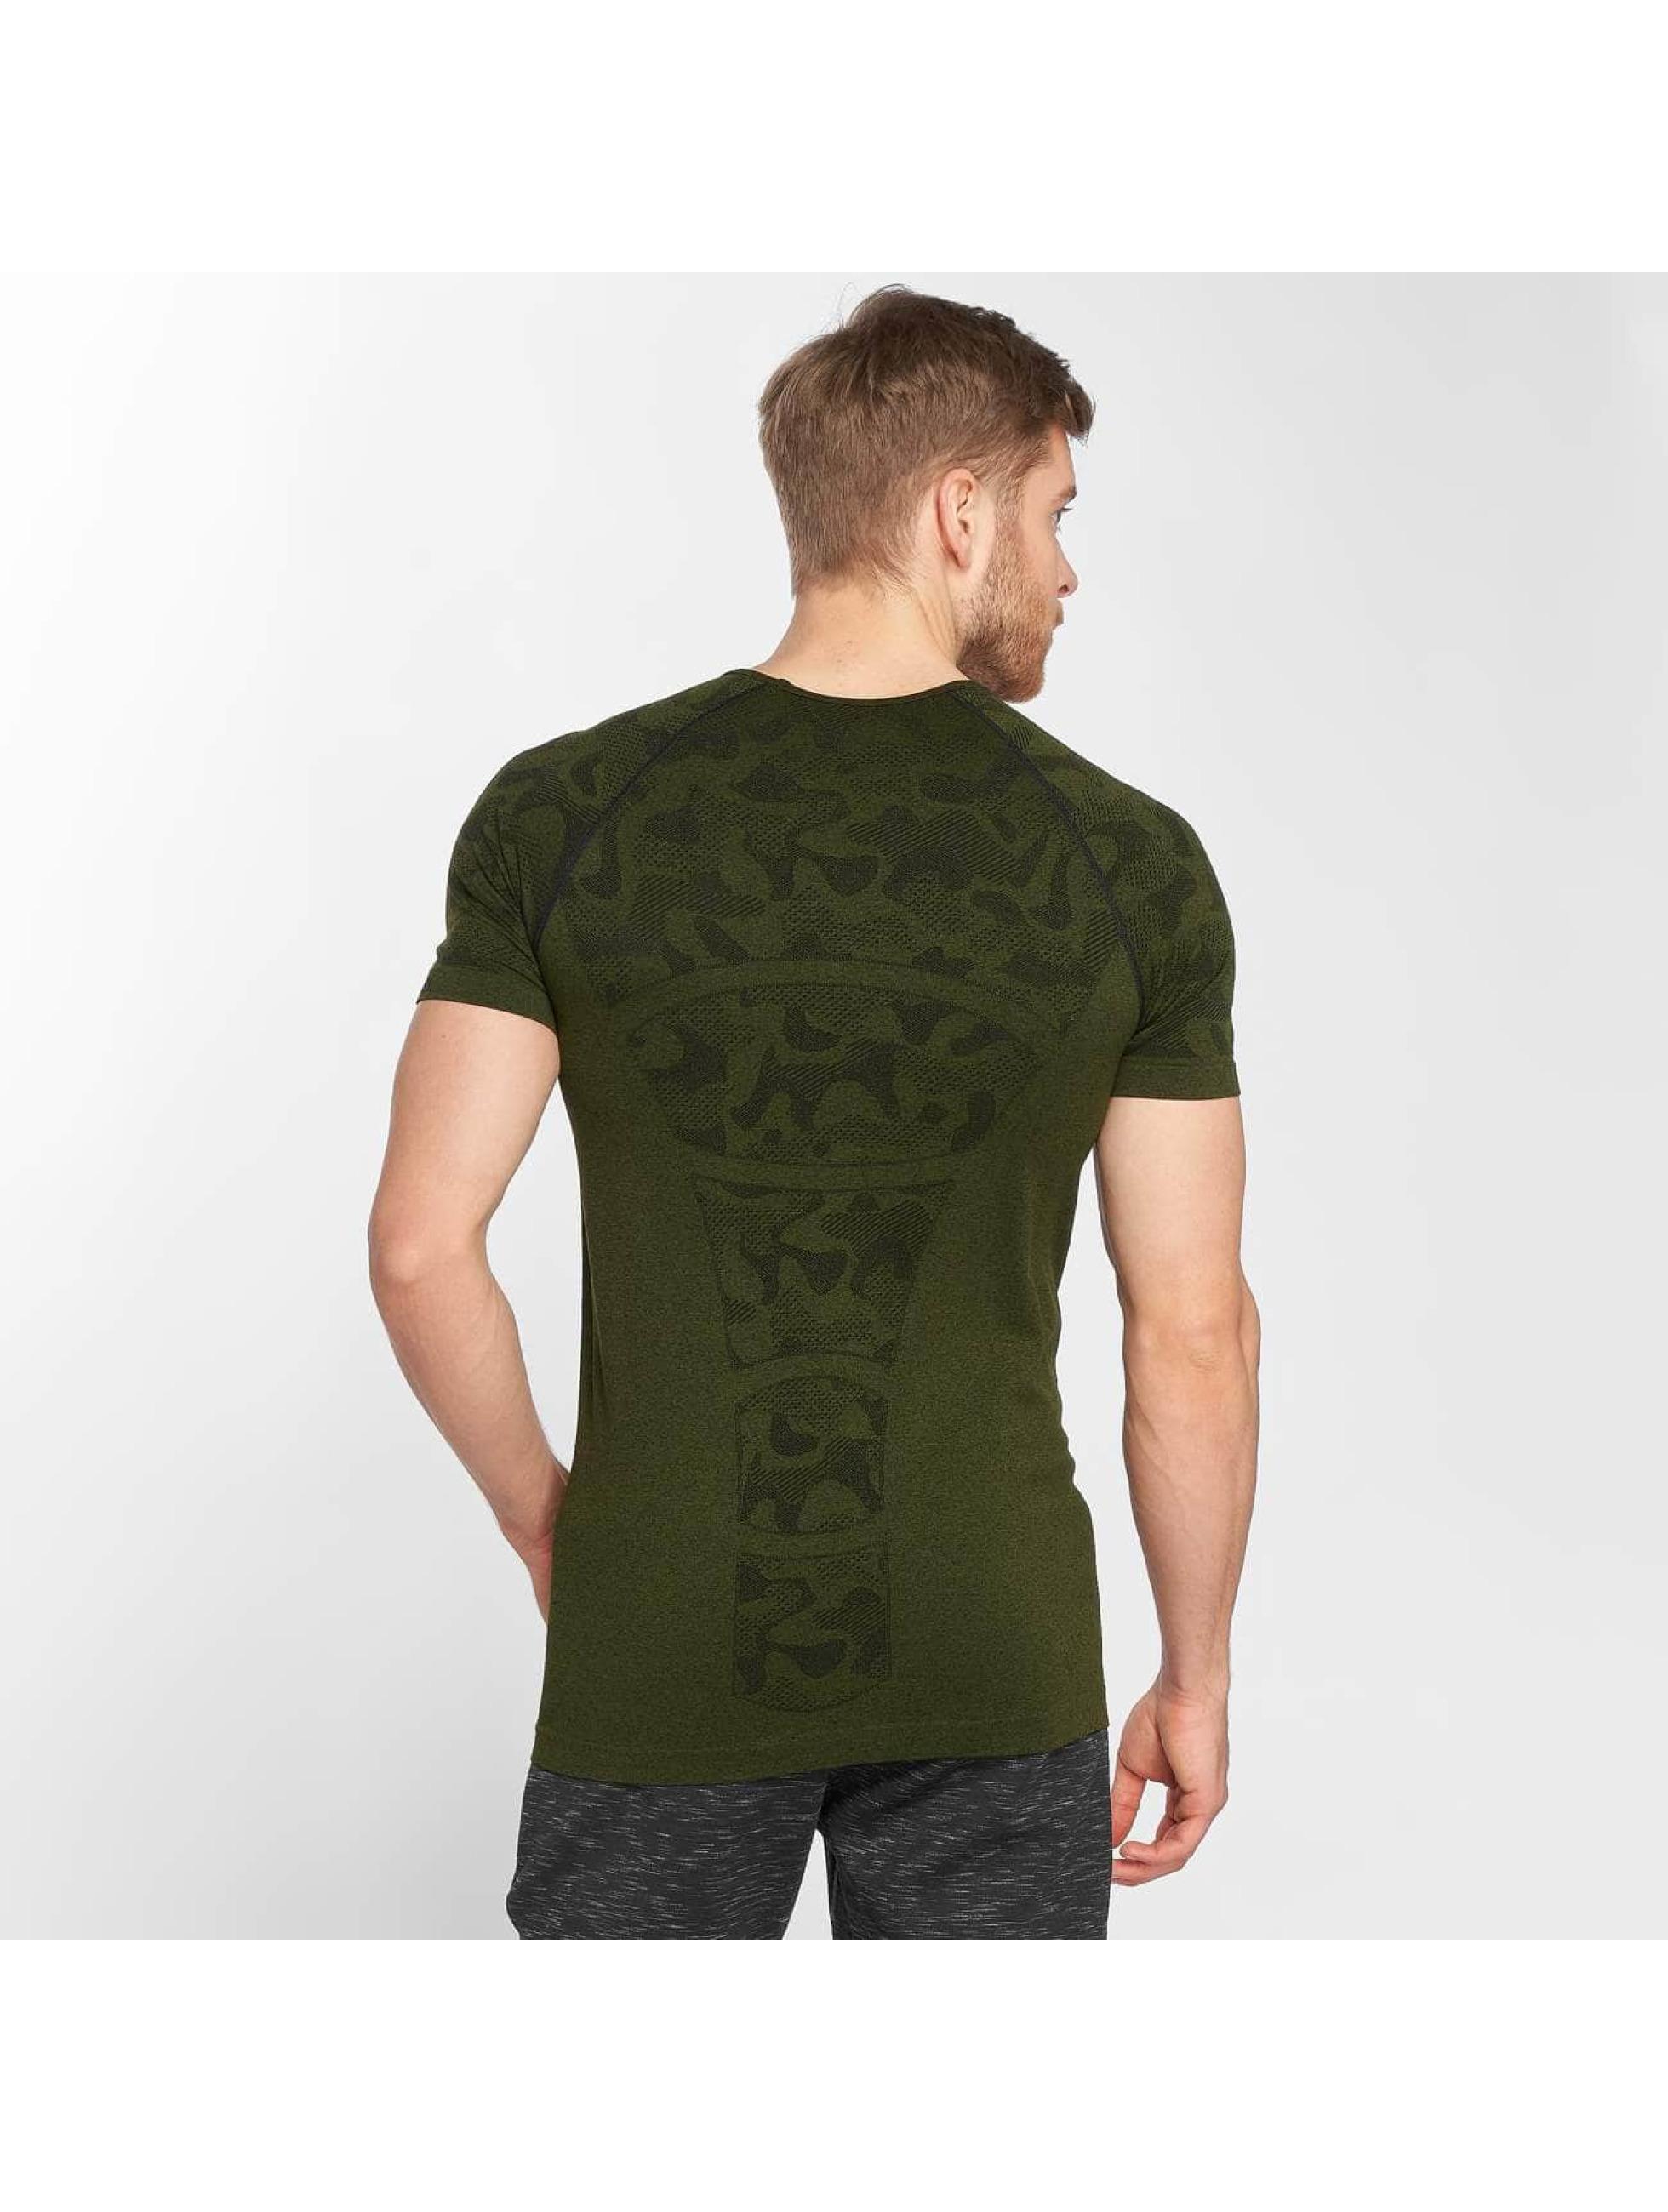 GymCodes T-skjorter Performance kamuflasje